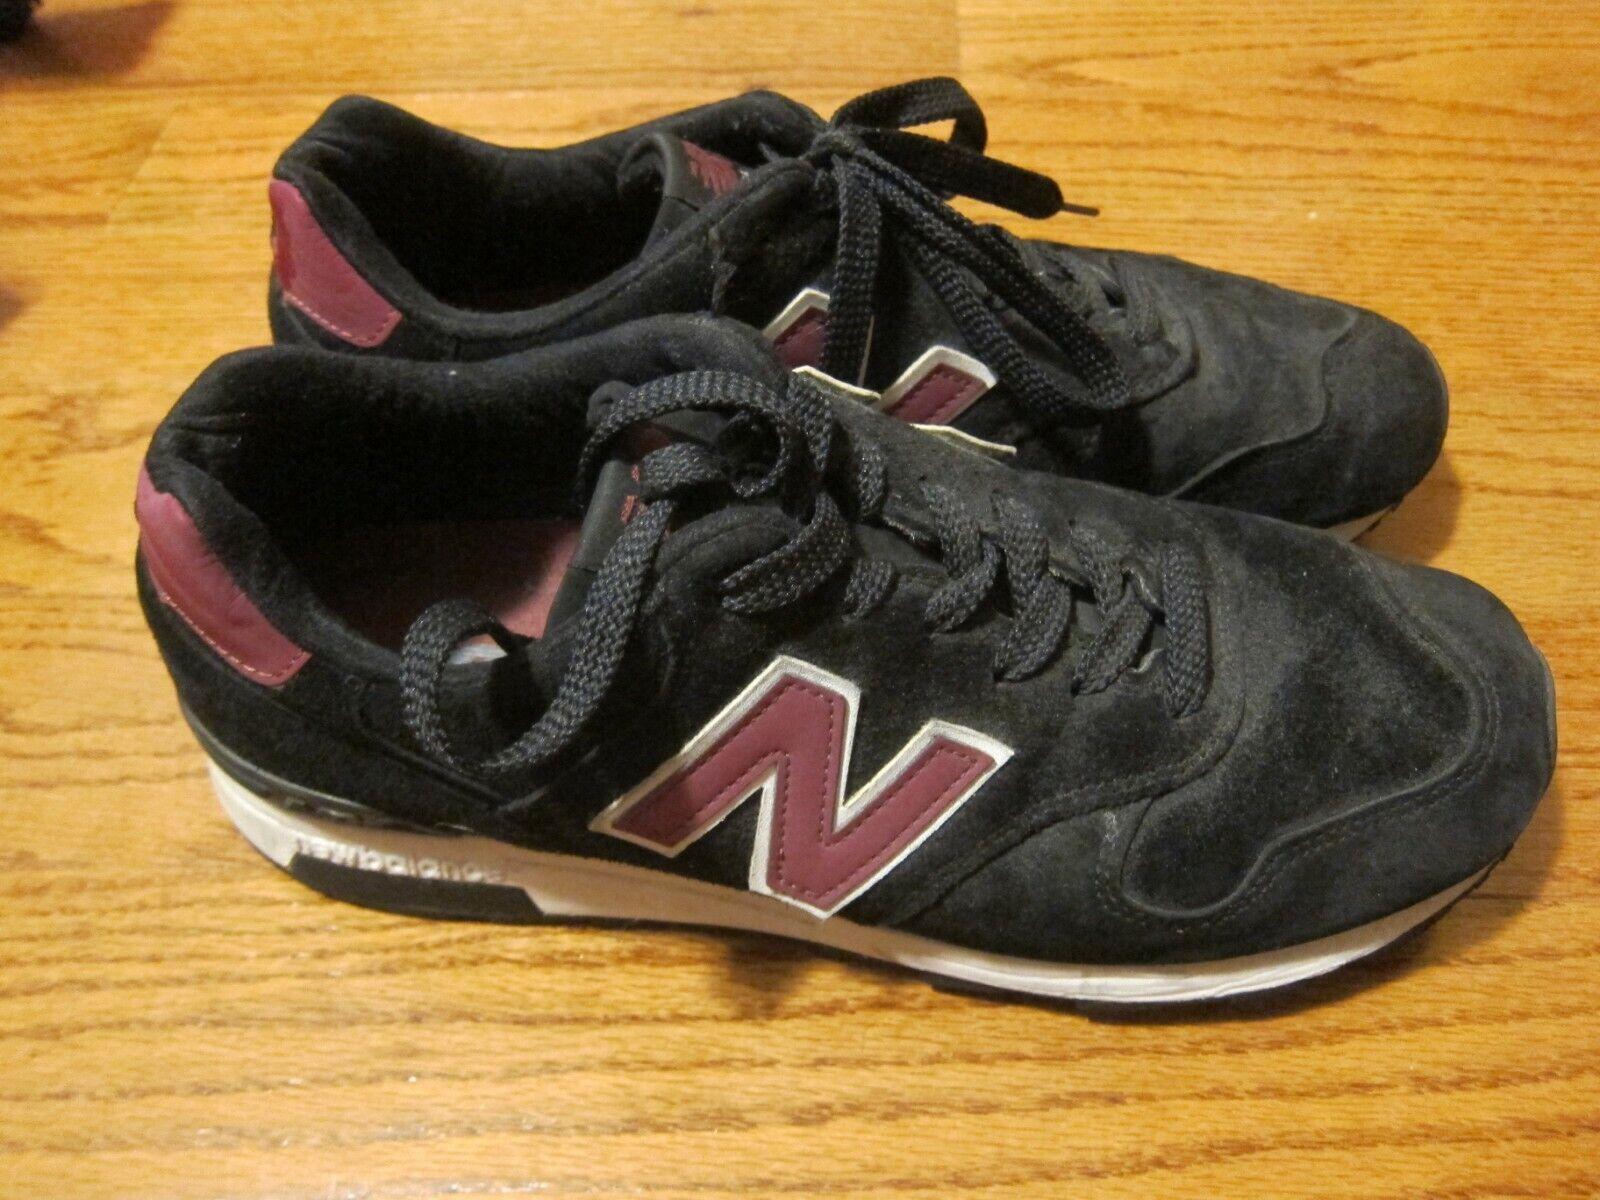 Para hombres 1400 Gamuza Correr Atléticos New Balance Zapatos-US tamaño 10.5